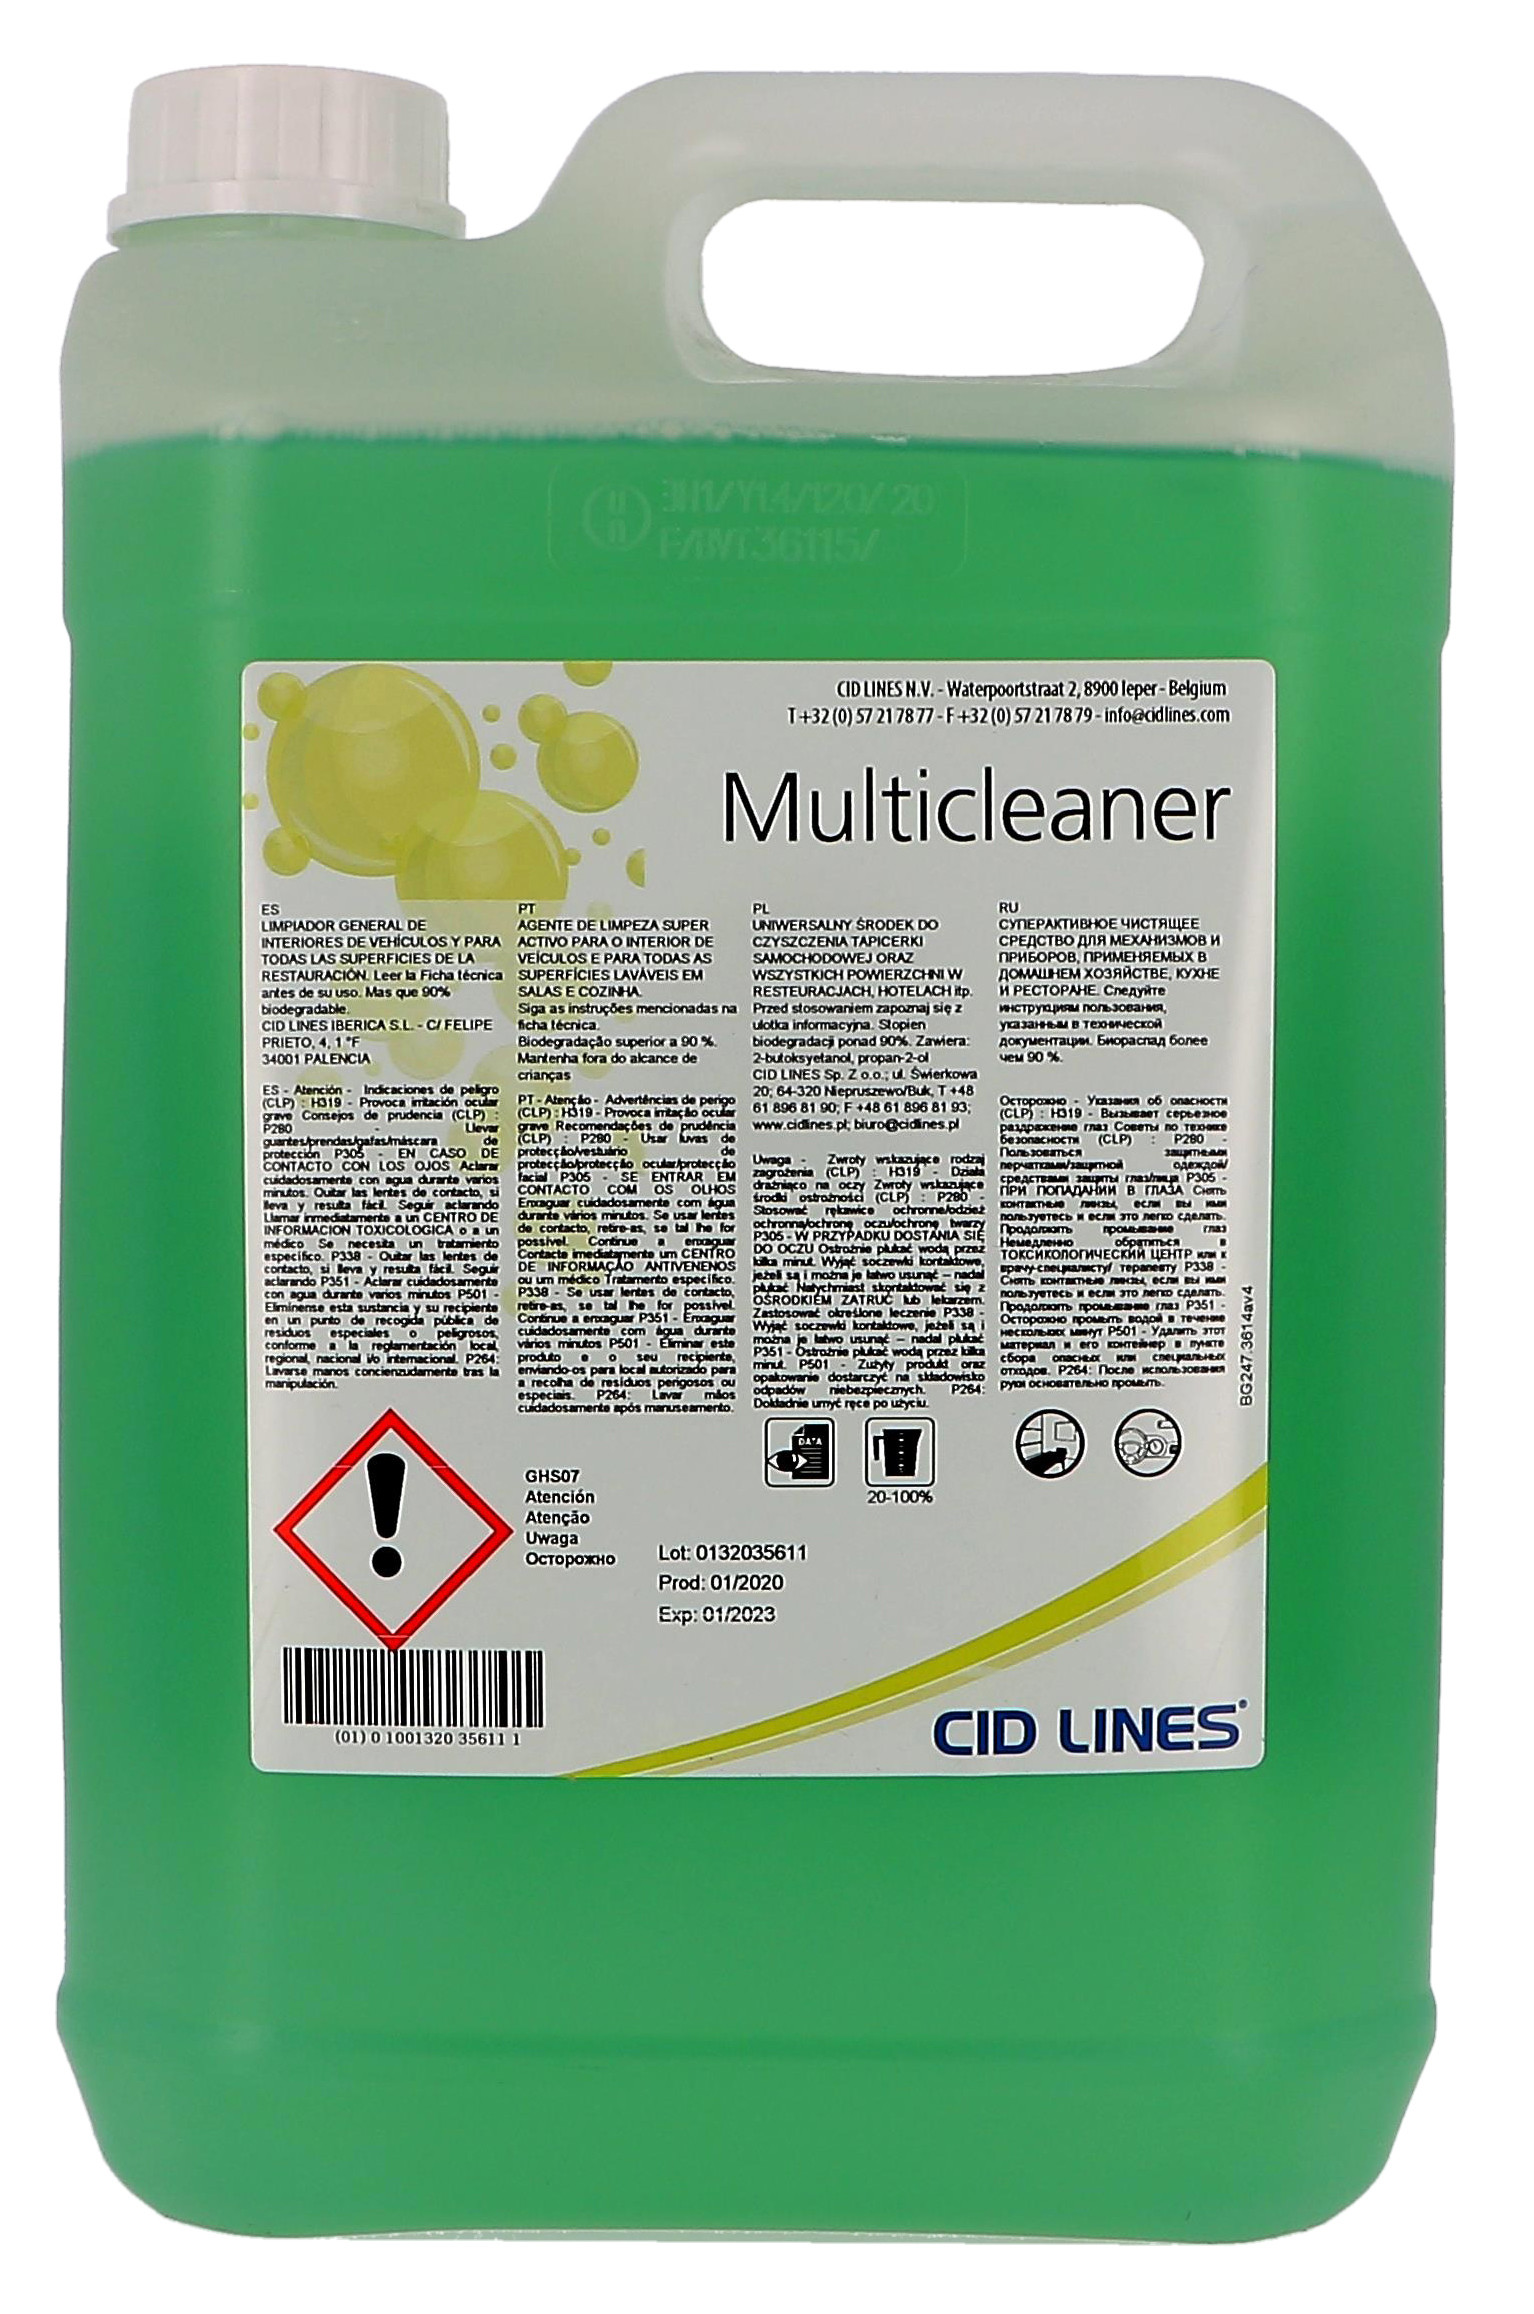 Multicleaner 5L Cid Lines